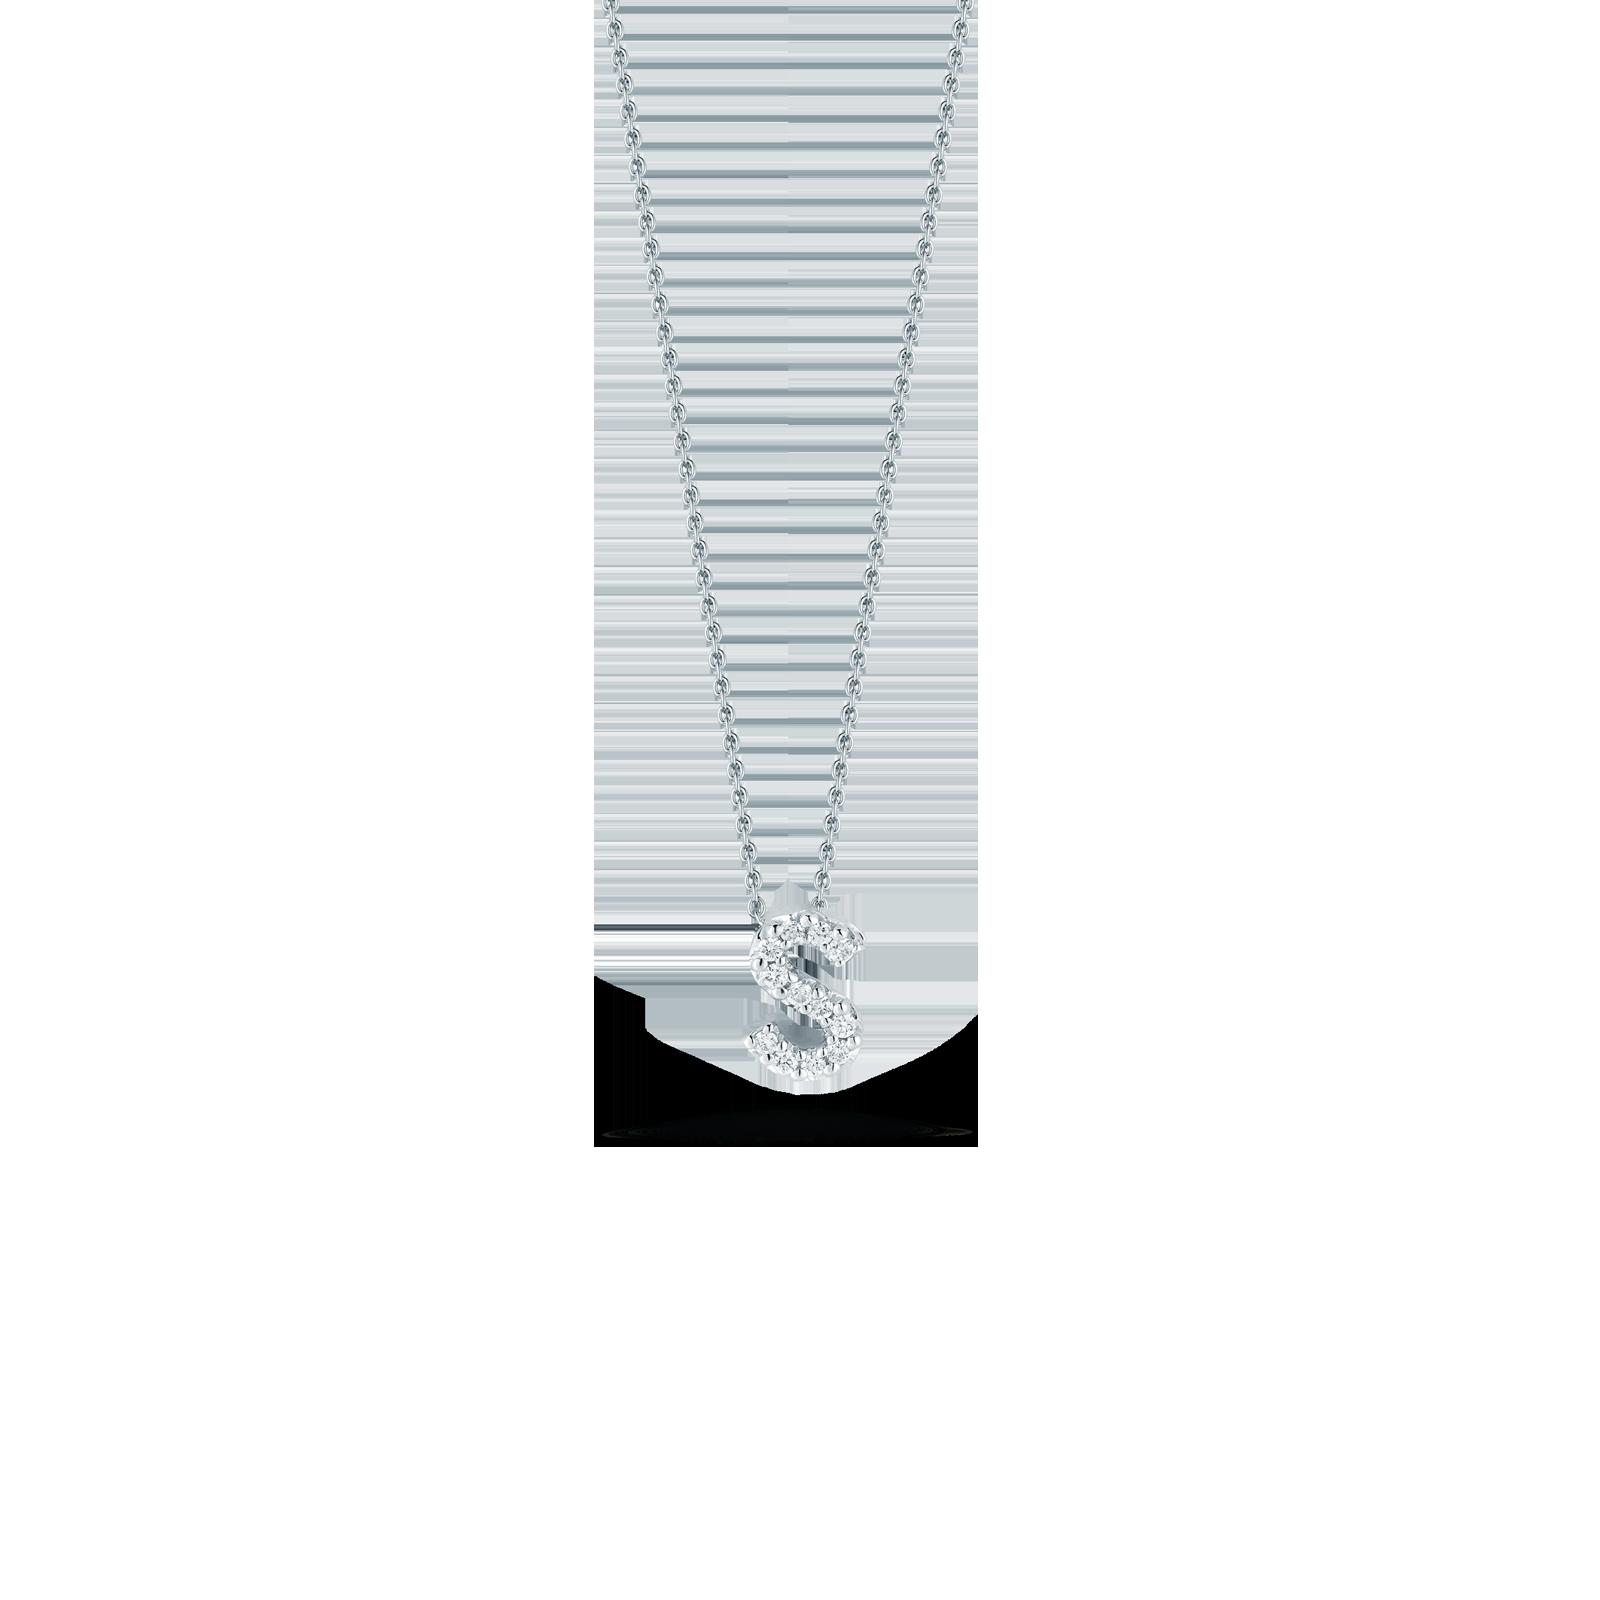 Tiny Treasures Love Letter S Pendant With Diamonds   DP25C0666 | Ware  Jewelers